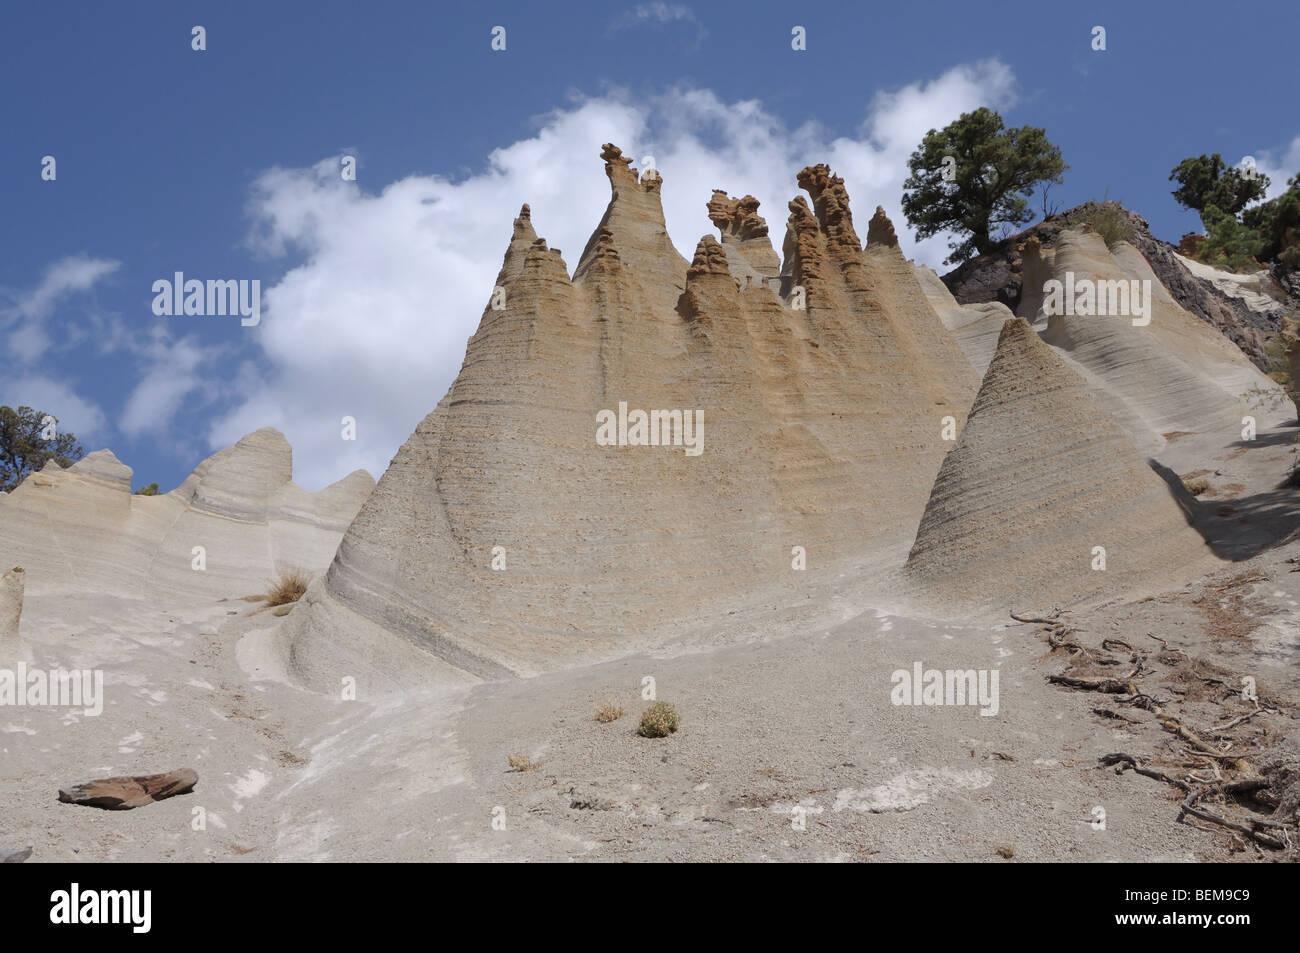 Rock Formations Paisaje Lunar on Canary Island Tenerife, Spain - Stock Image